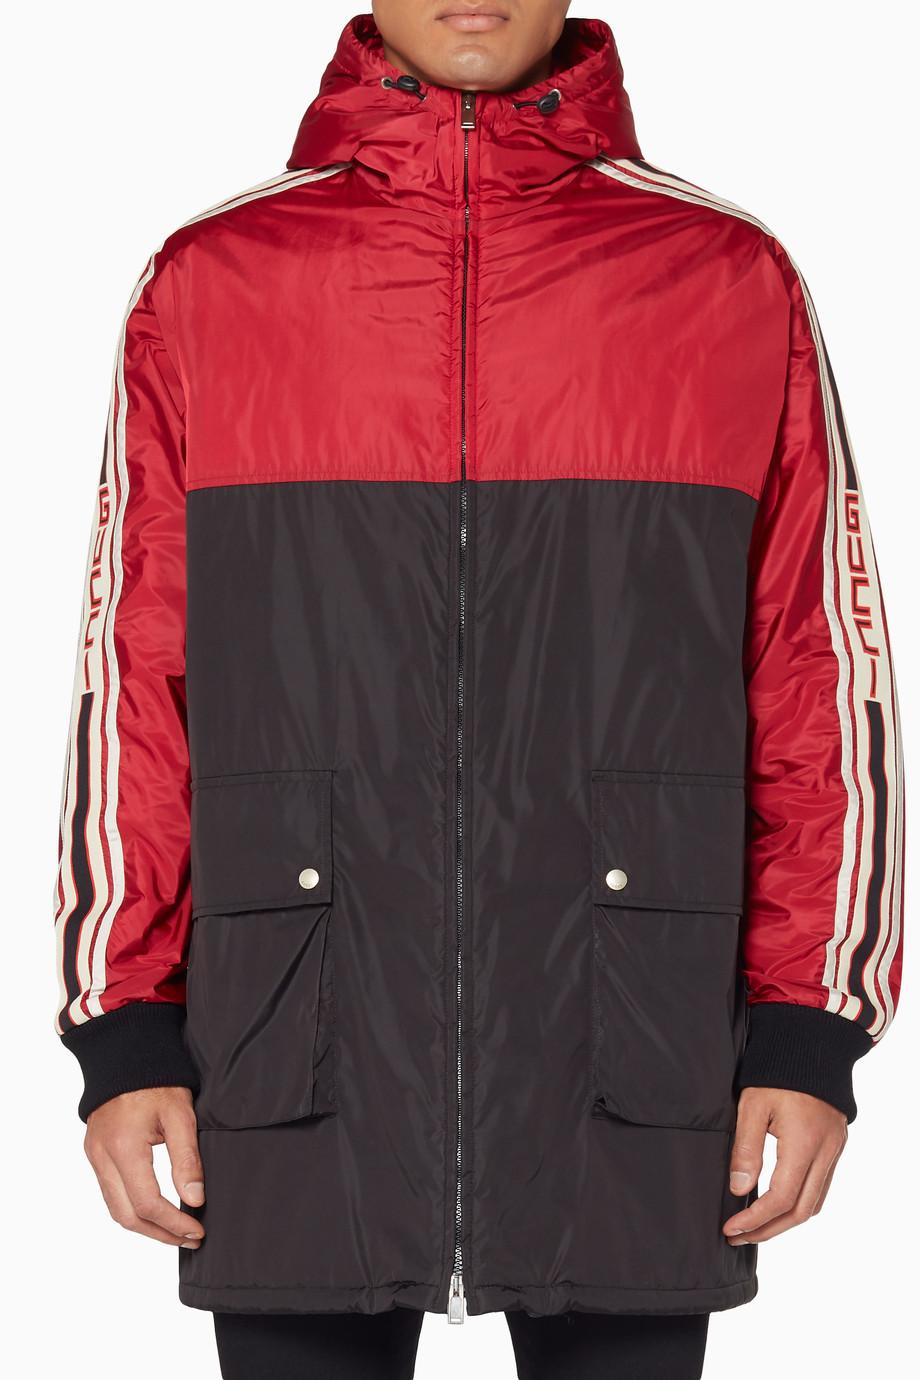 598d2000b714f Shop Gucci Red Red   Black Gucci Stripe Nylon Coat for Men